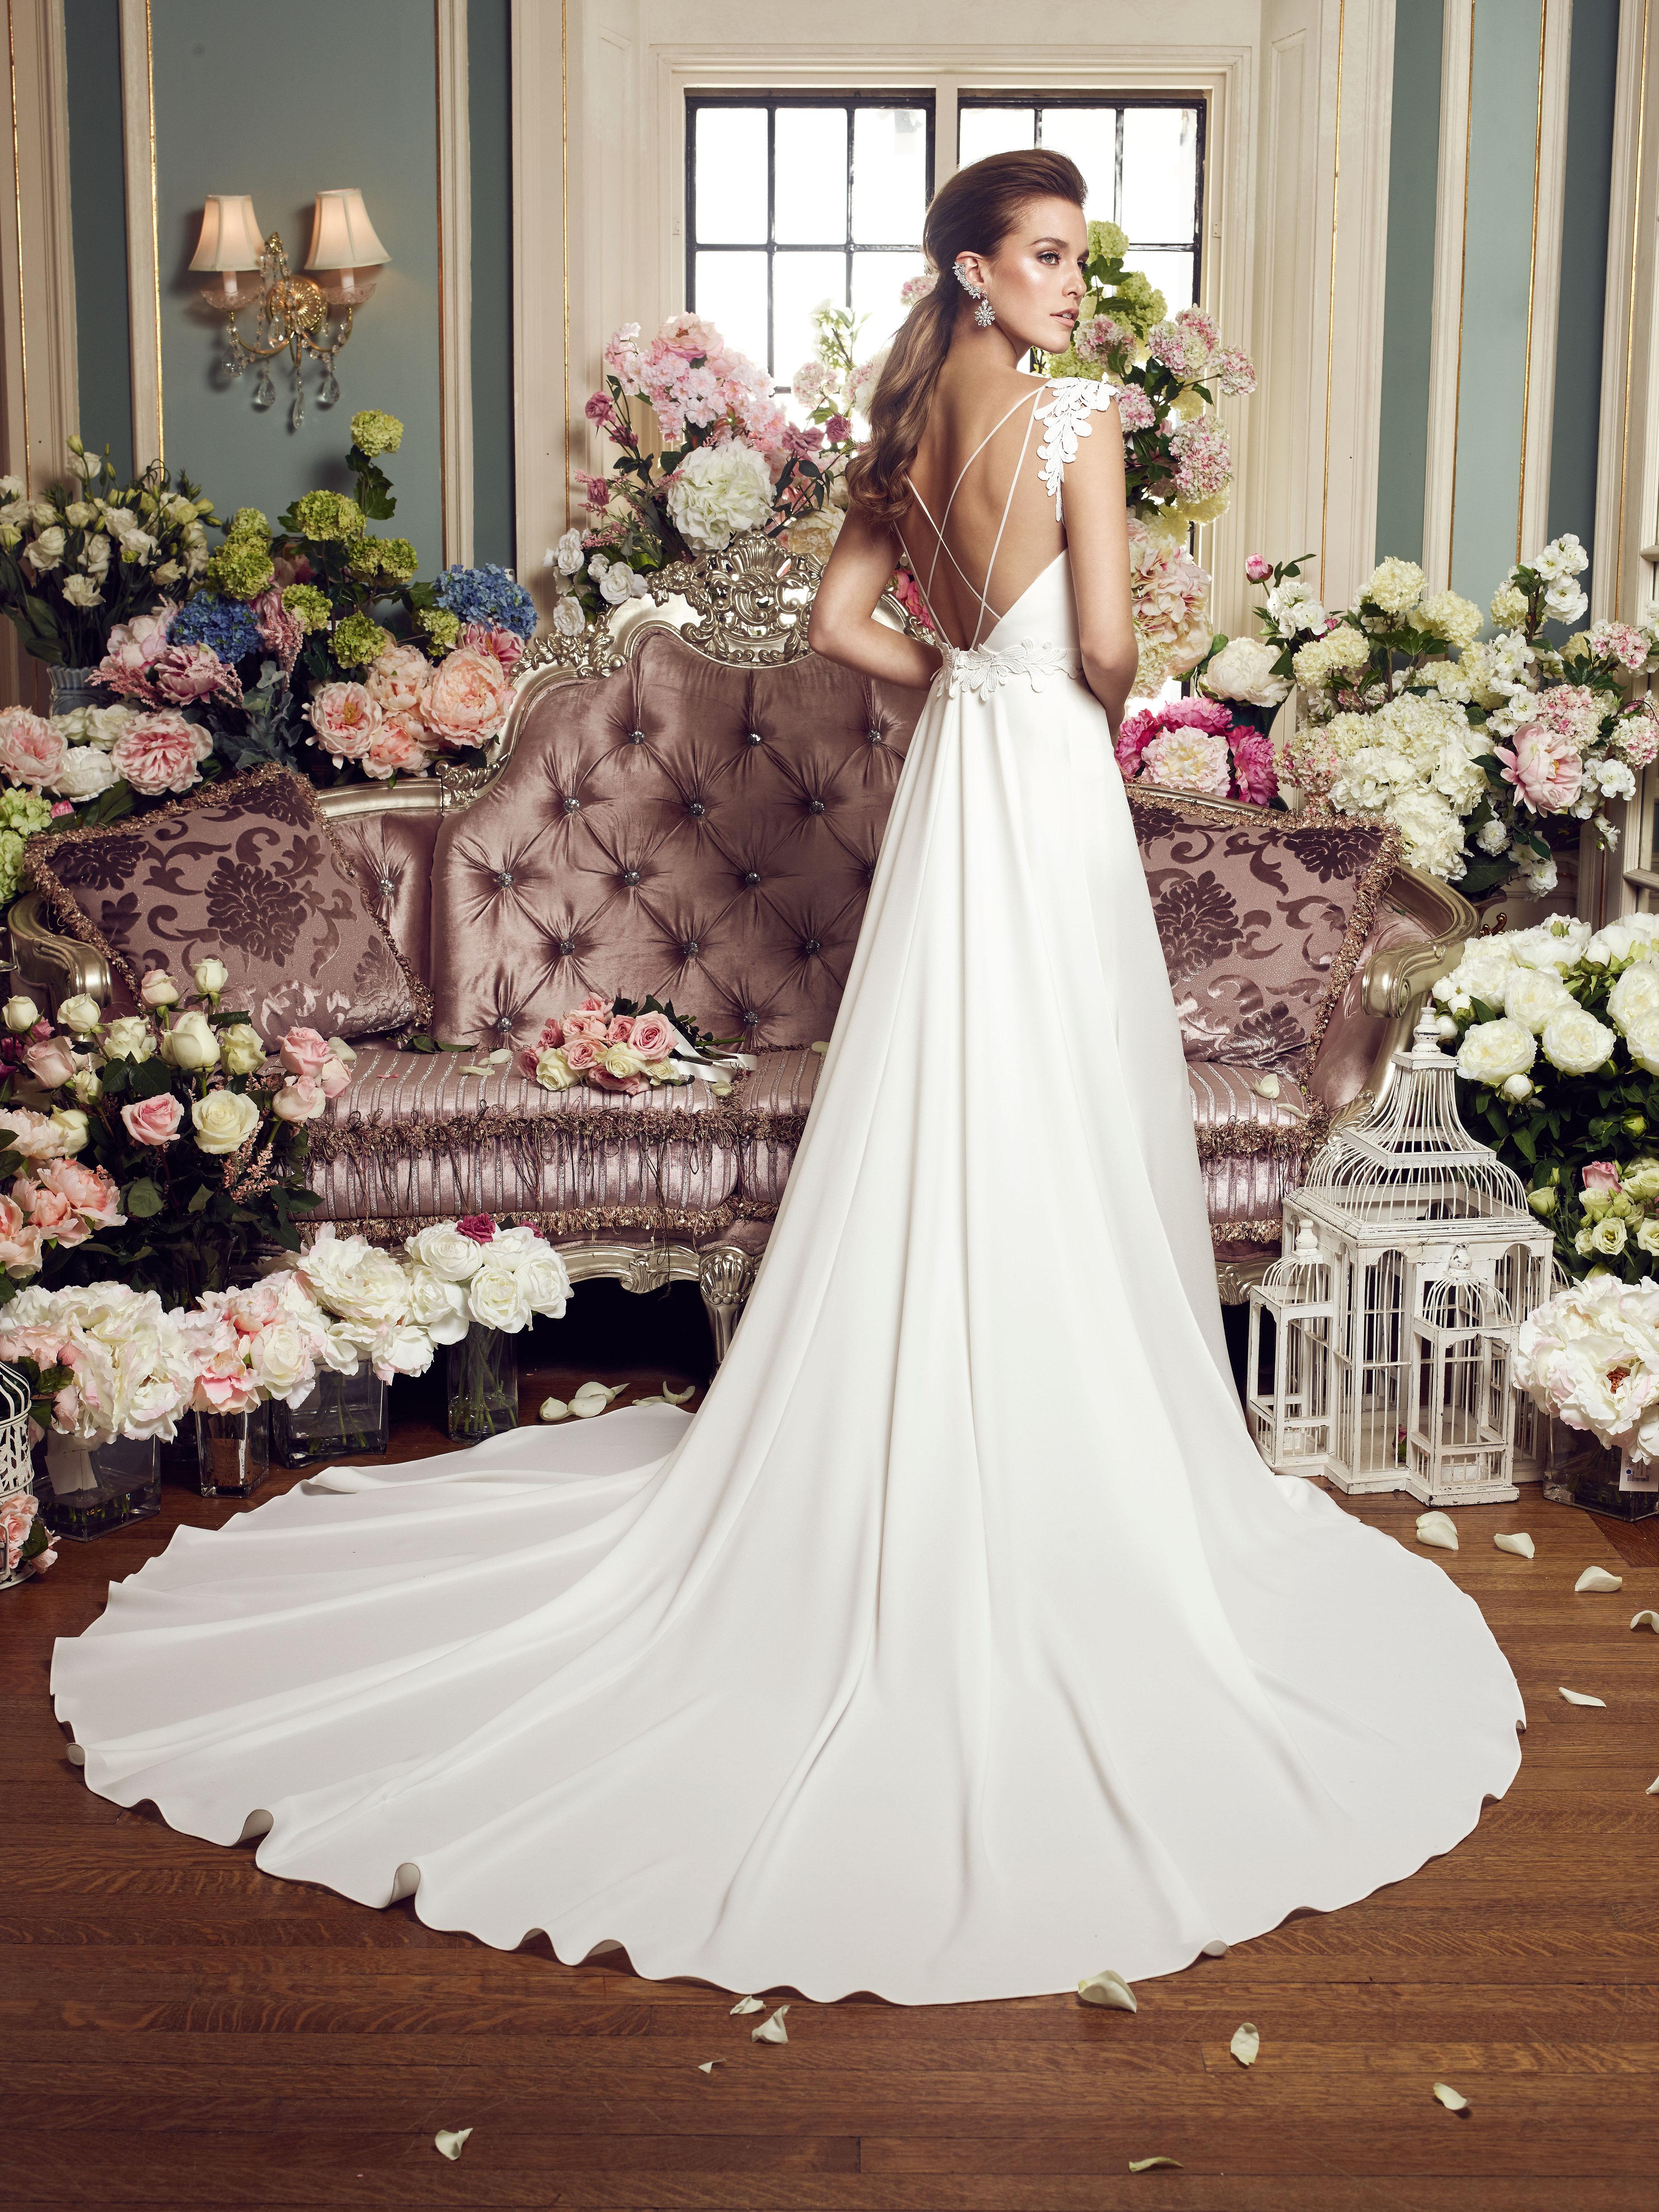 Wedding Dresses| May & Grace Bridal Boutique | Haslemere | Surrey |